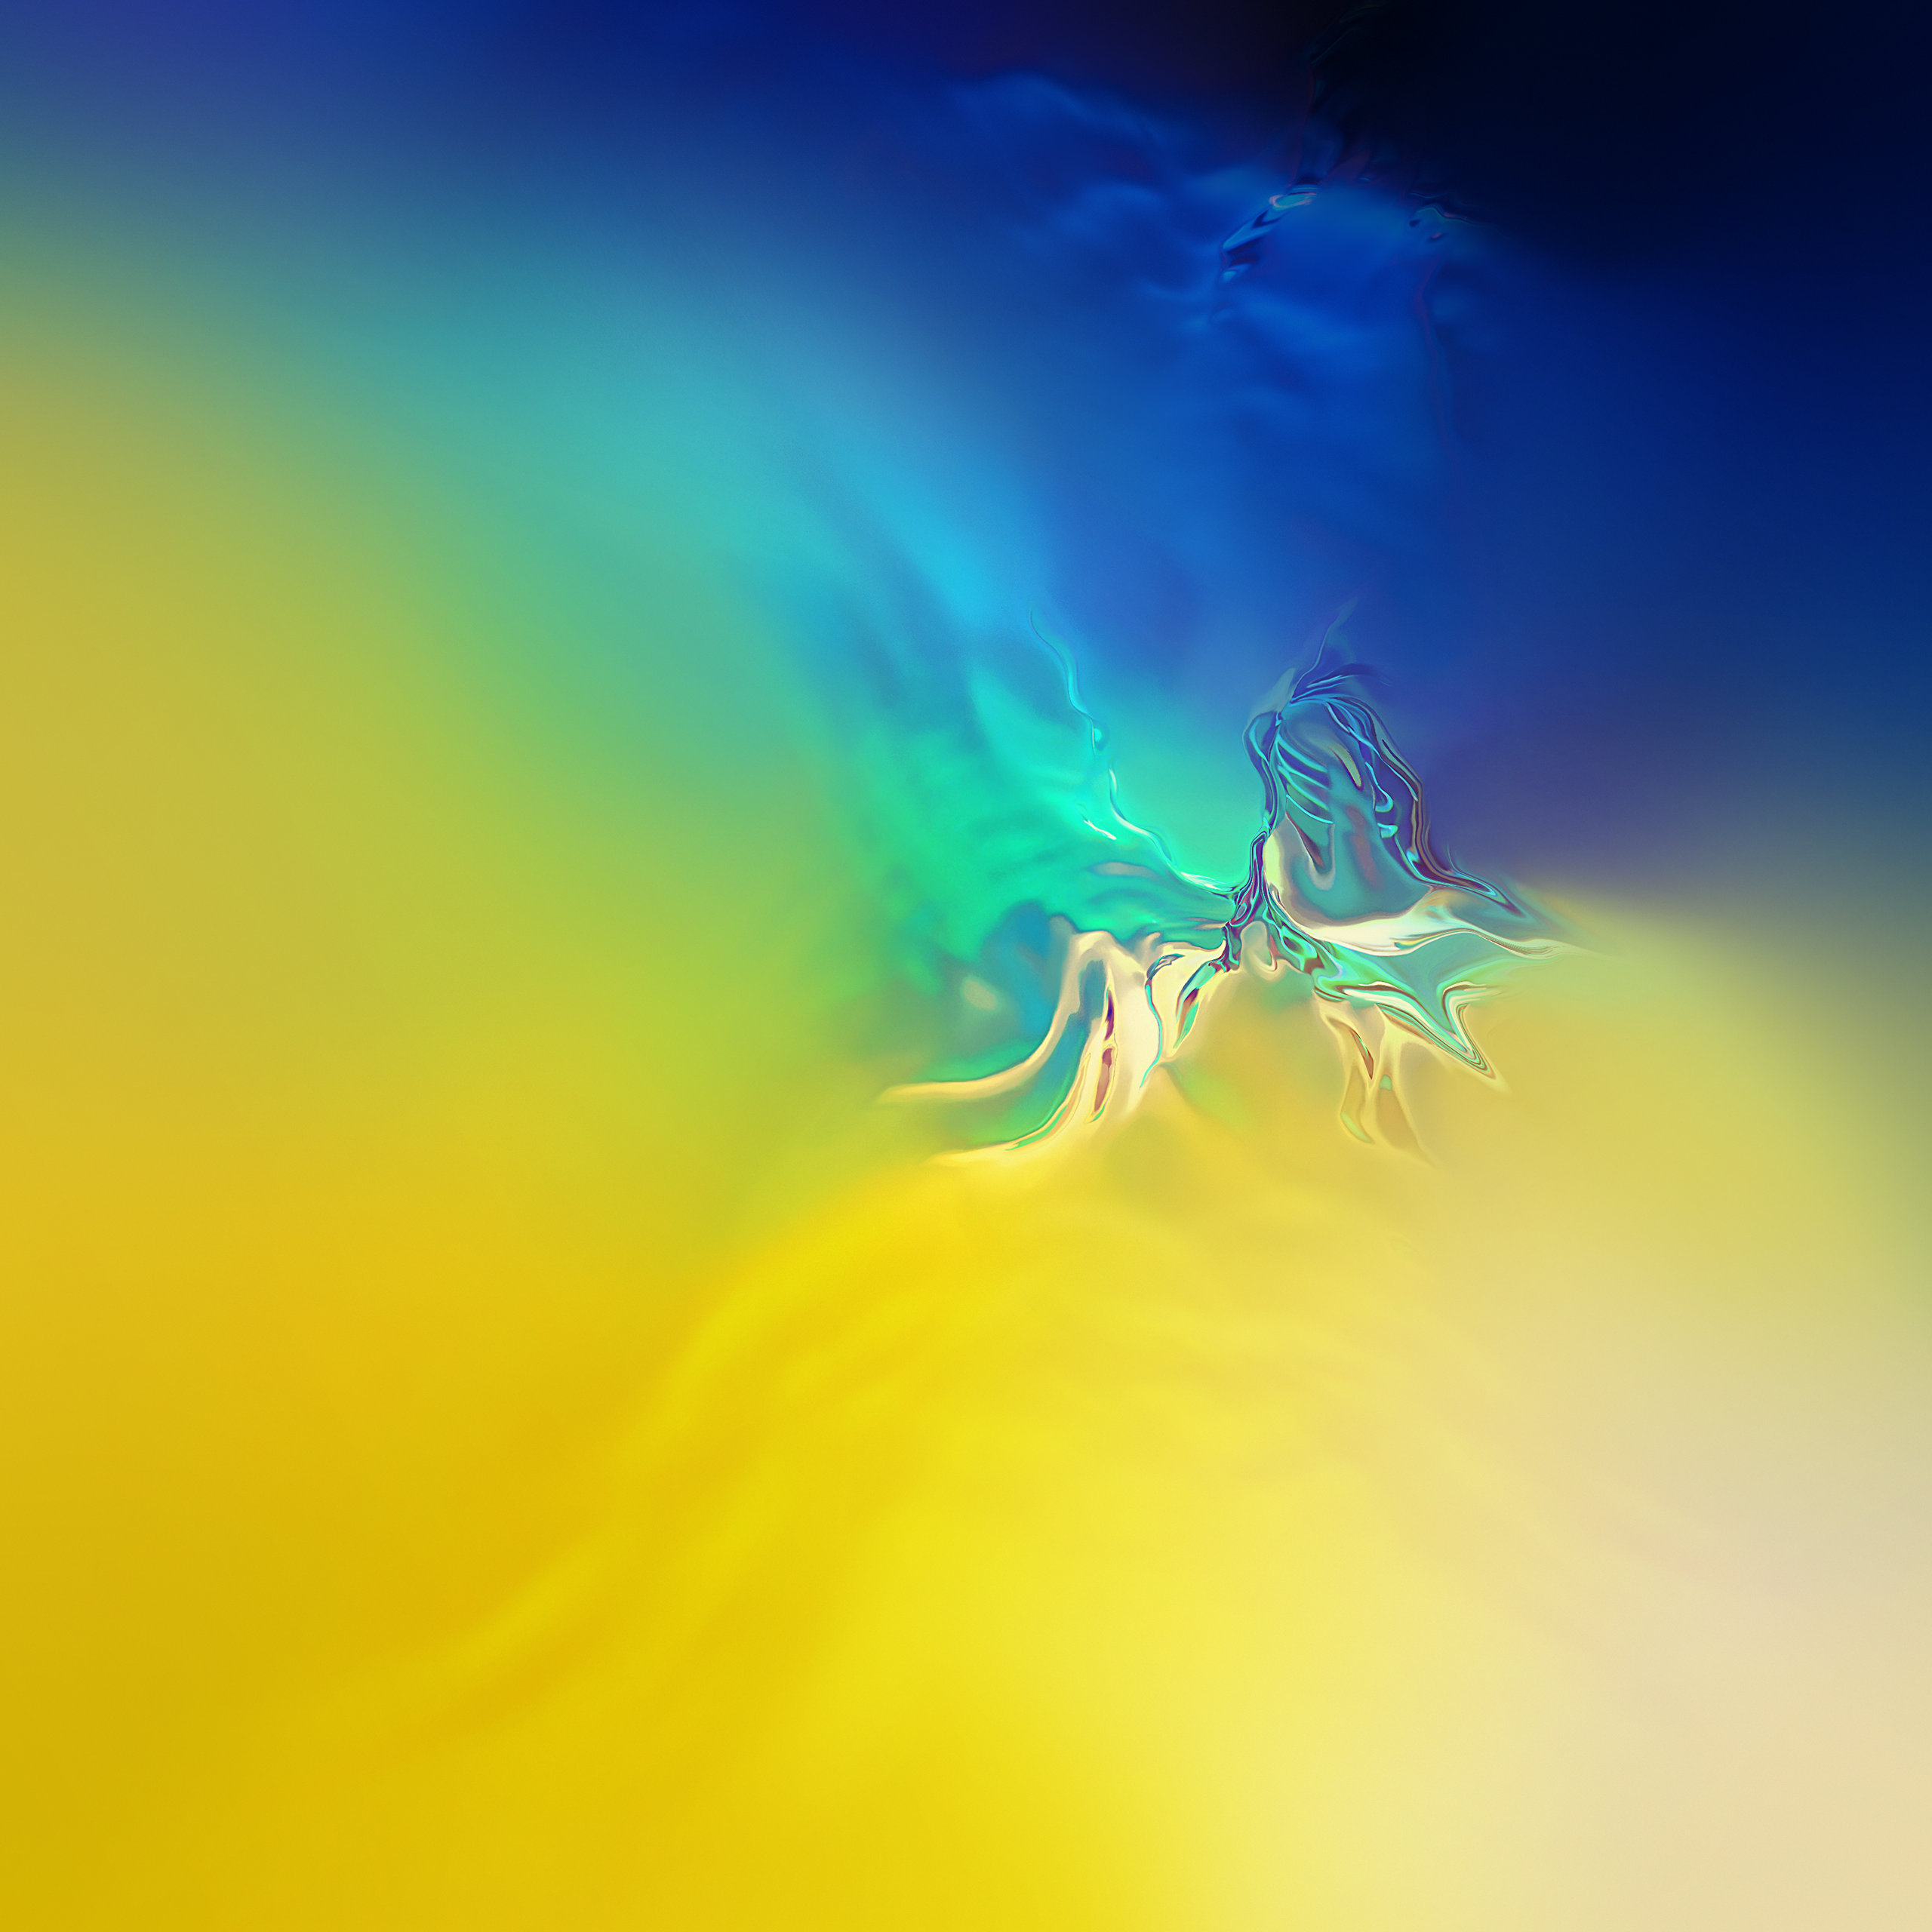 Download Samsung Galaxy S10 wallpaper - SamMobile